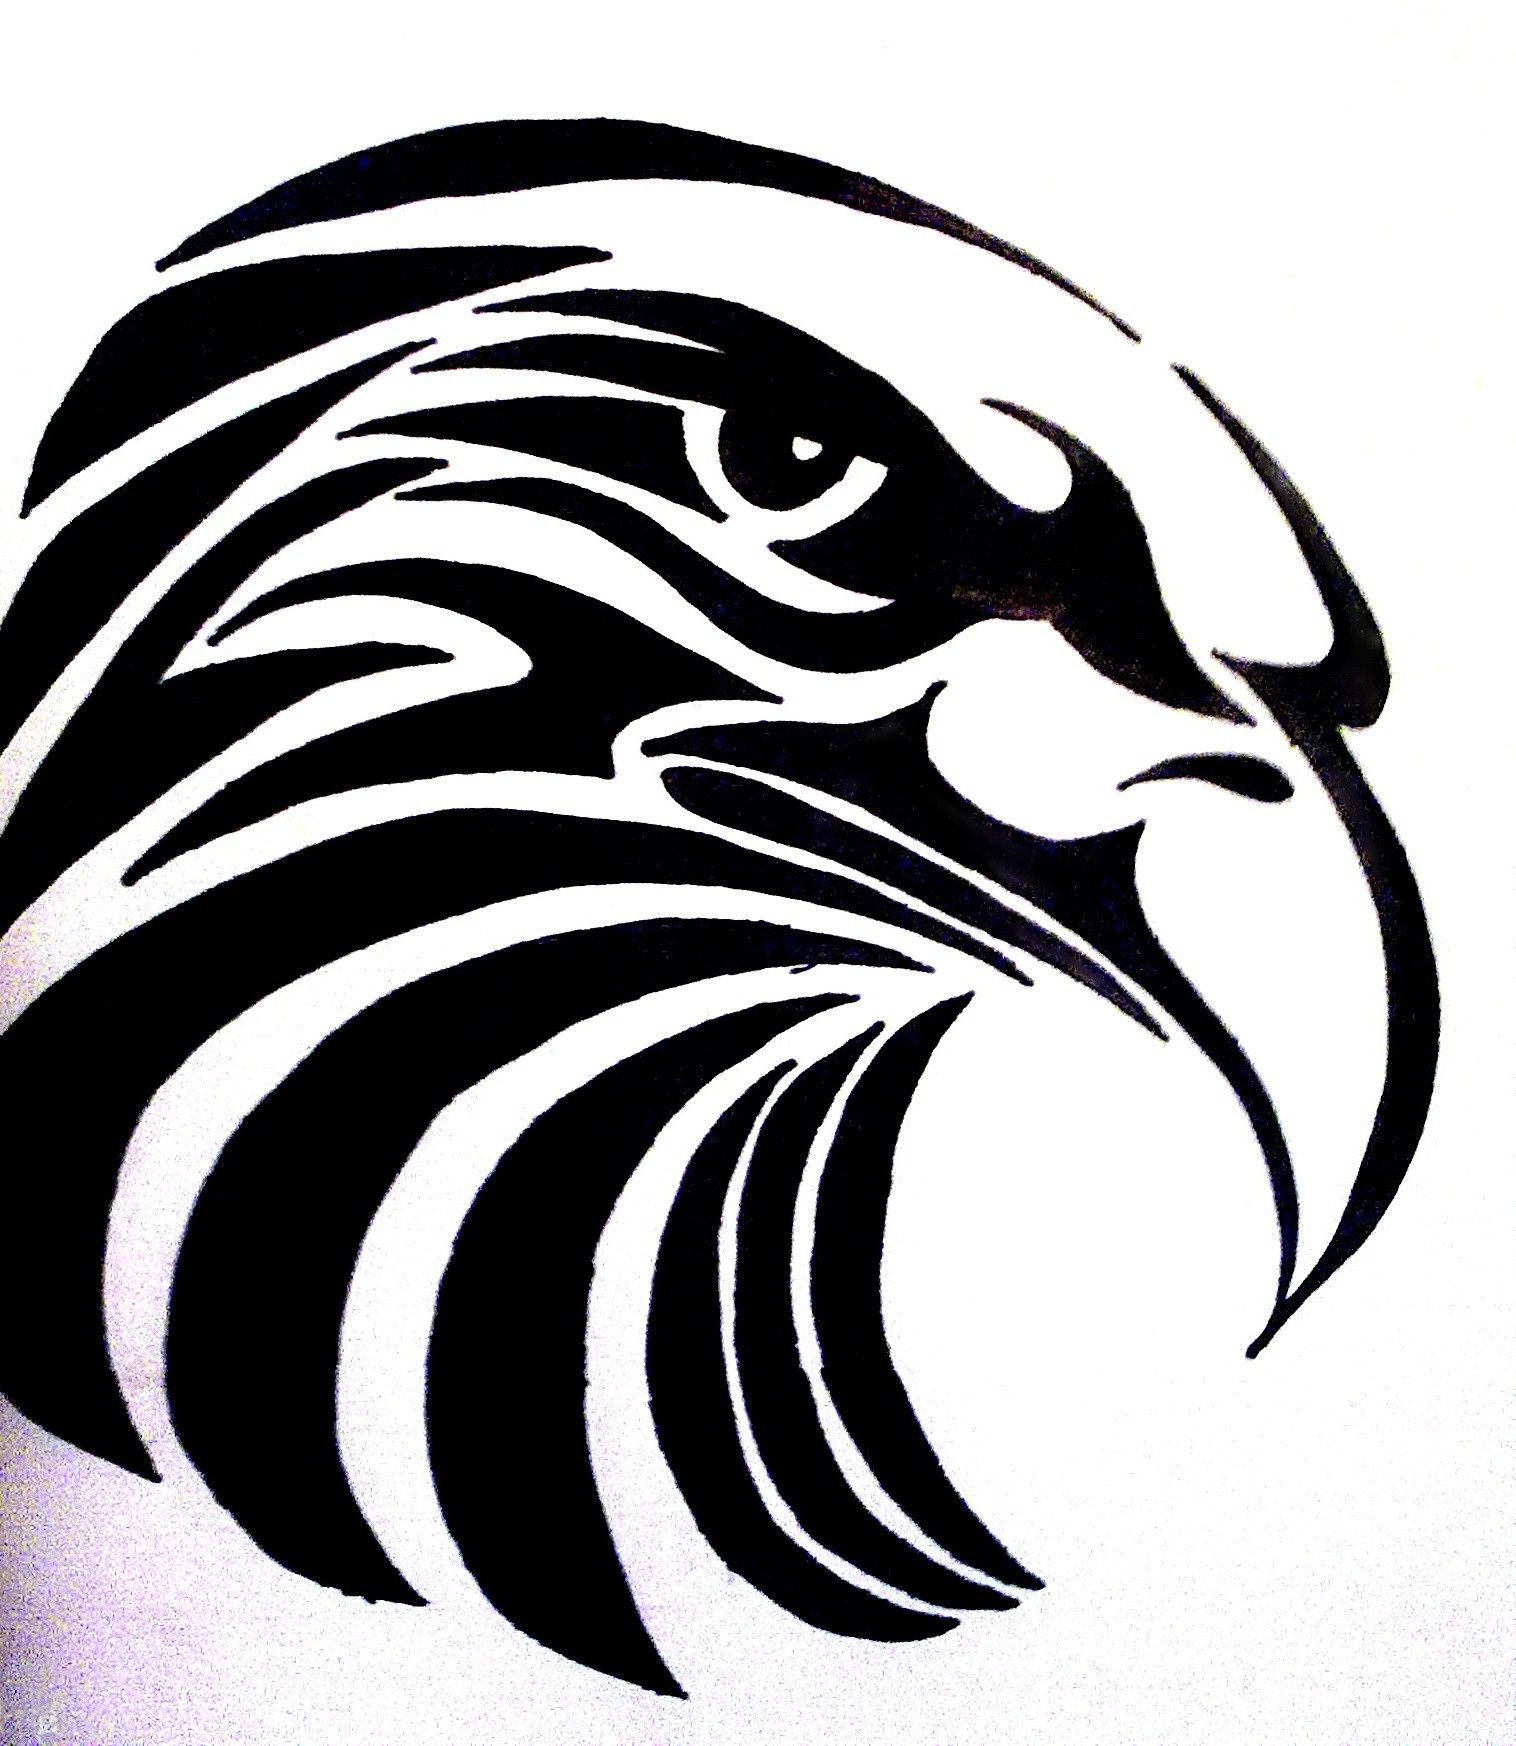 Tribal Eagle Tattoo By Bogi90 On Deviantart Tribal Eagle Tattoo Eagle Tattoo Eagle Art